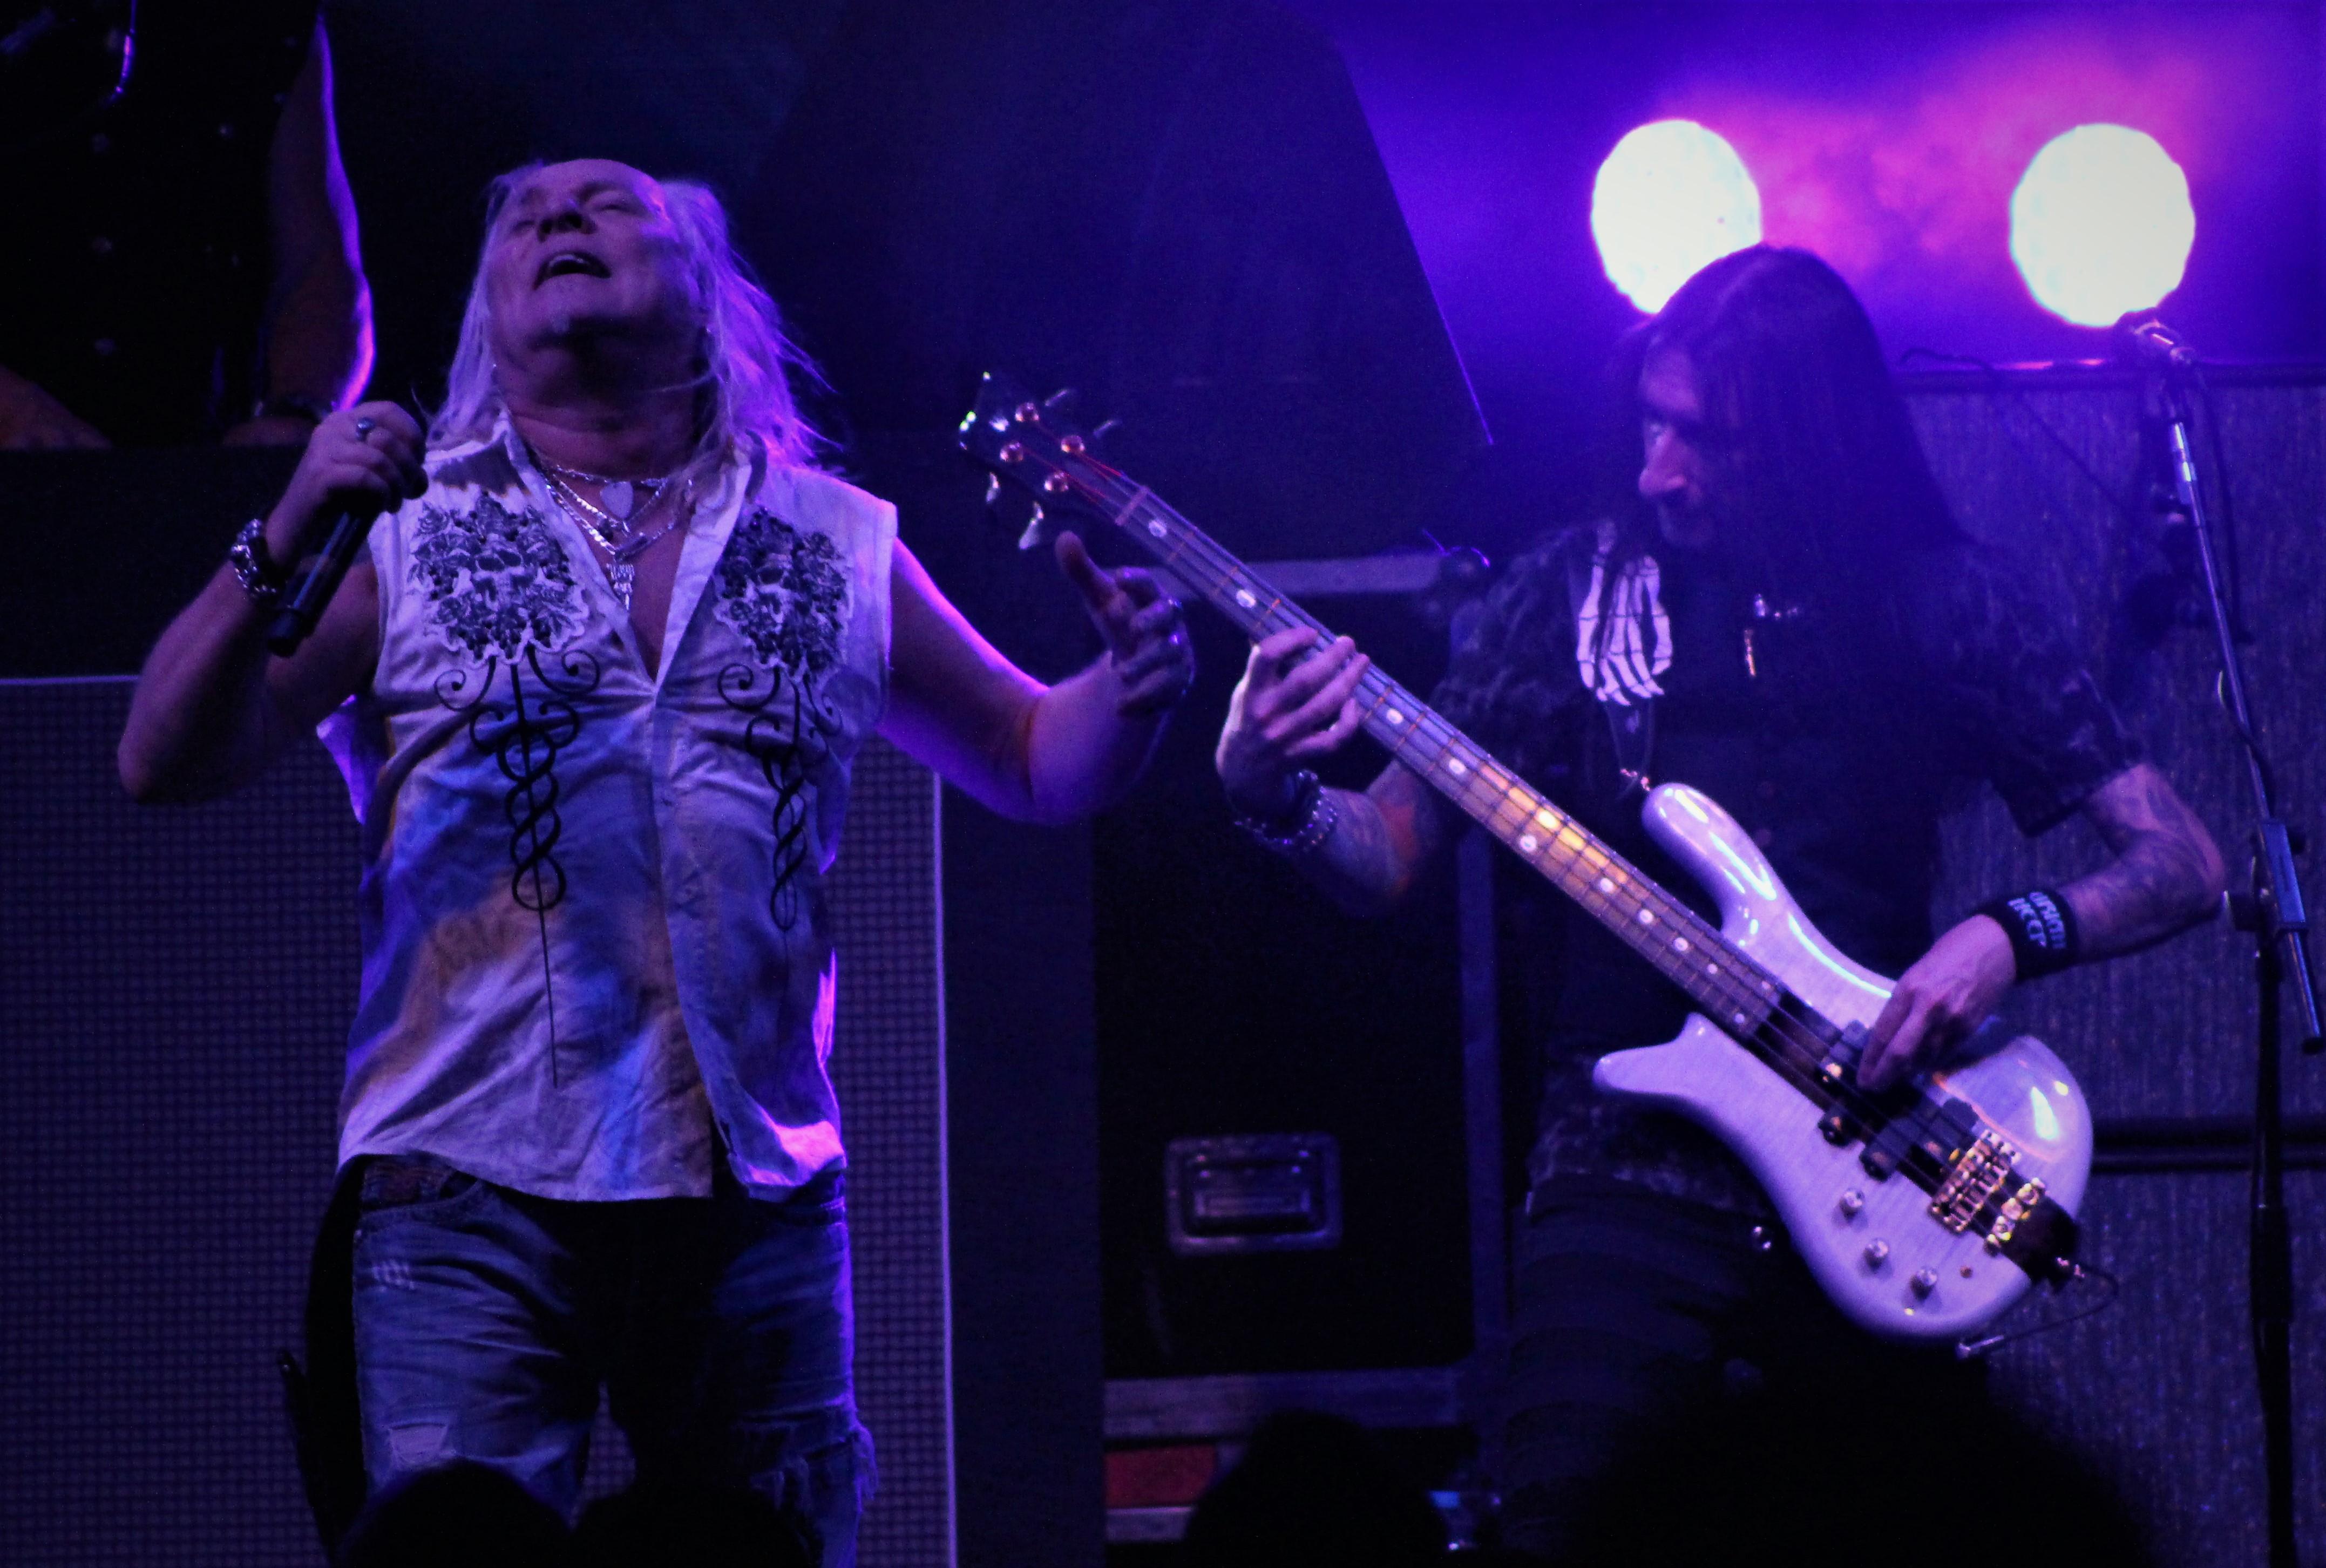 Day 2 - Main Stage_6 - Uriah Heep (21)